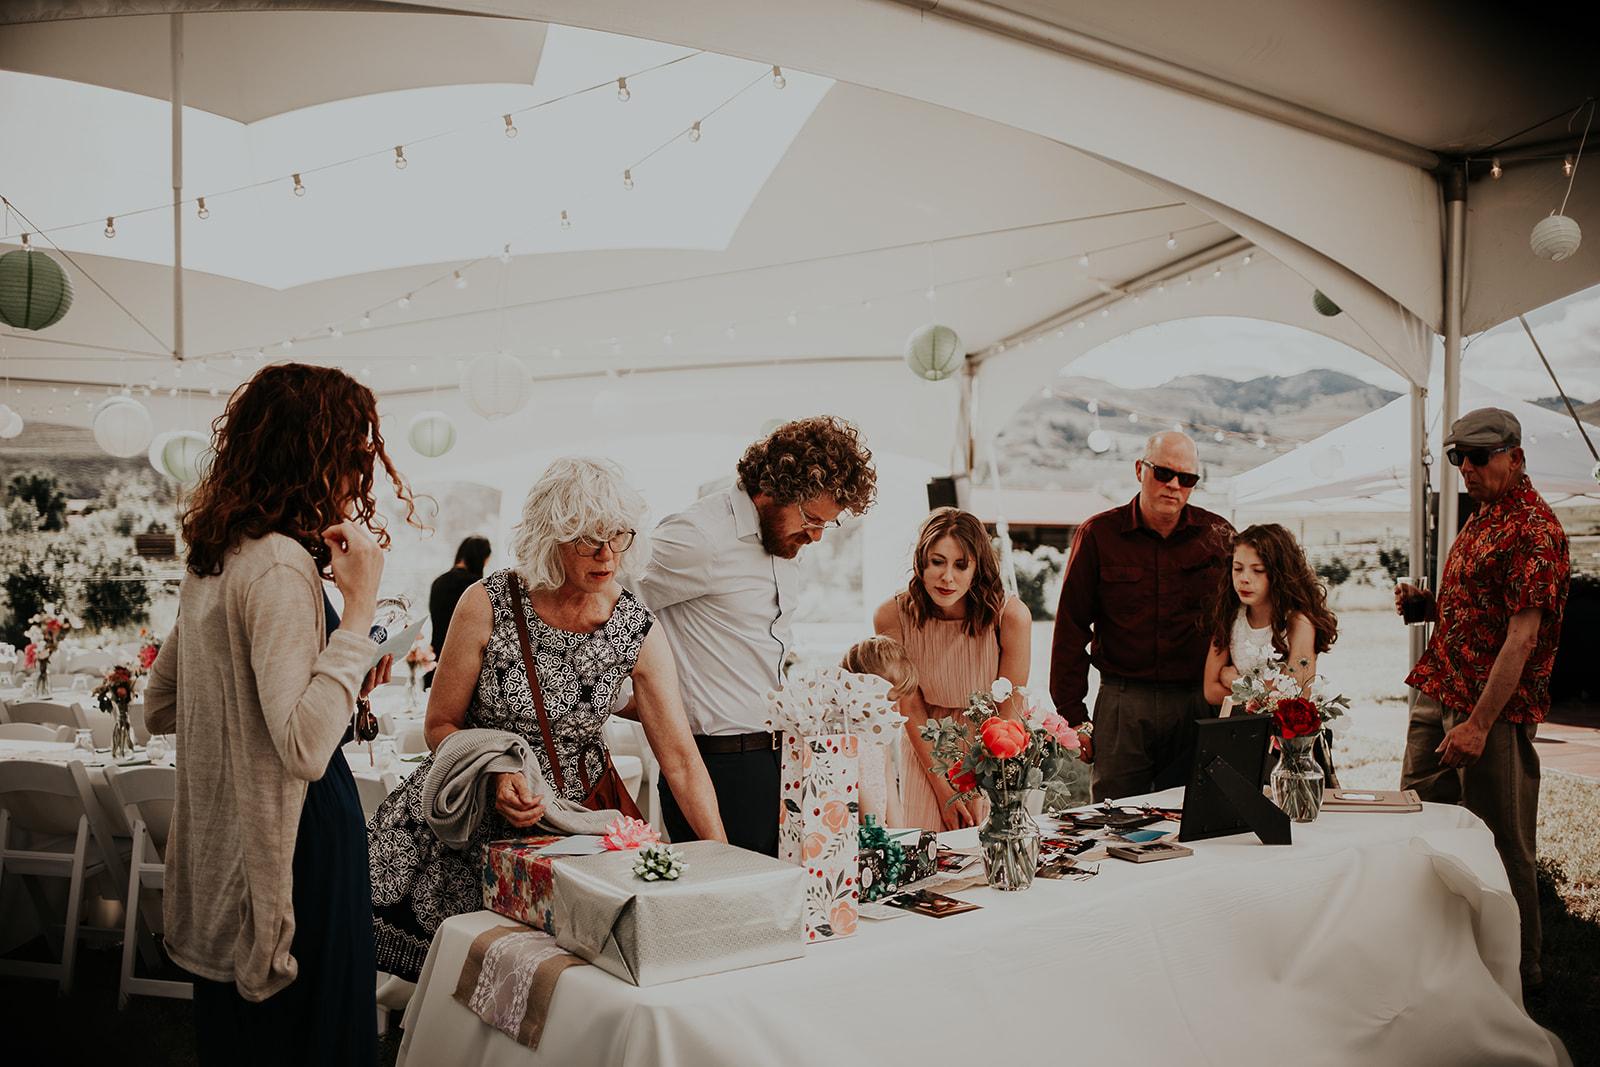 north-cascades-elopement-wedding-winthrop-wedding-photographer-megan-gallagher-photography (1).jpg